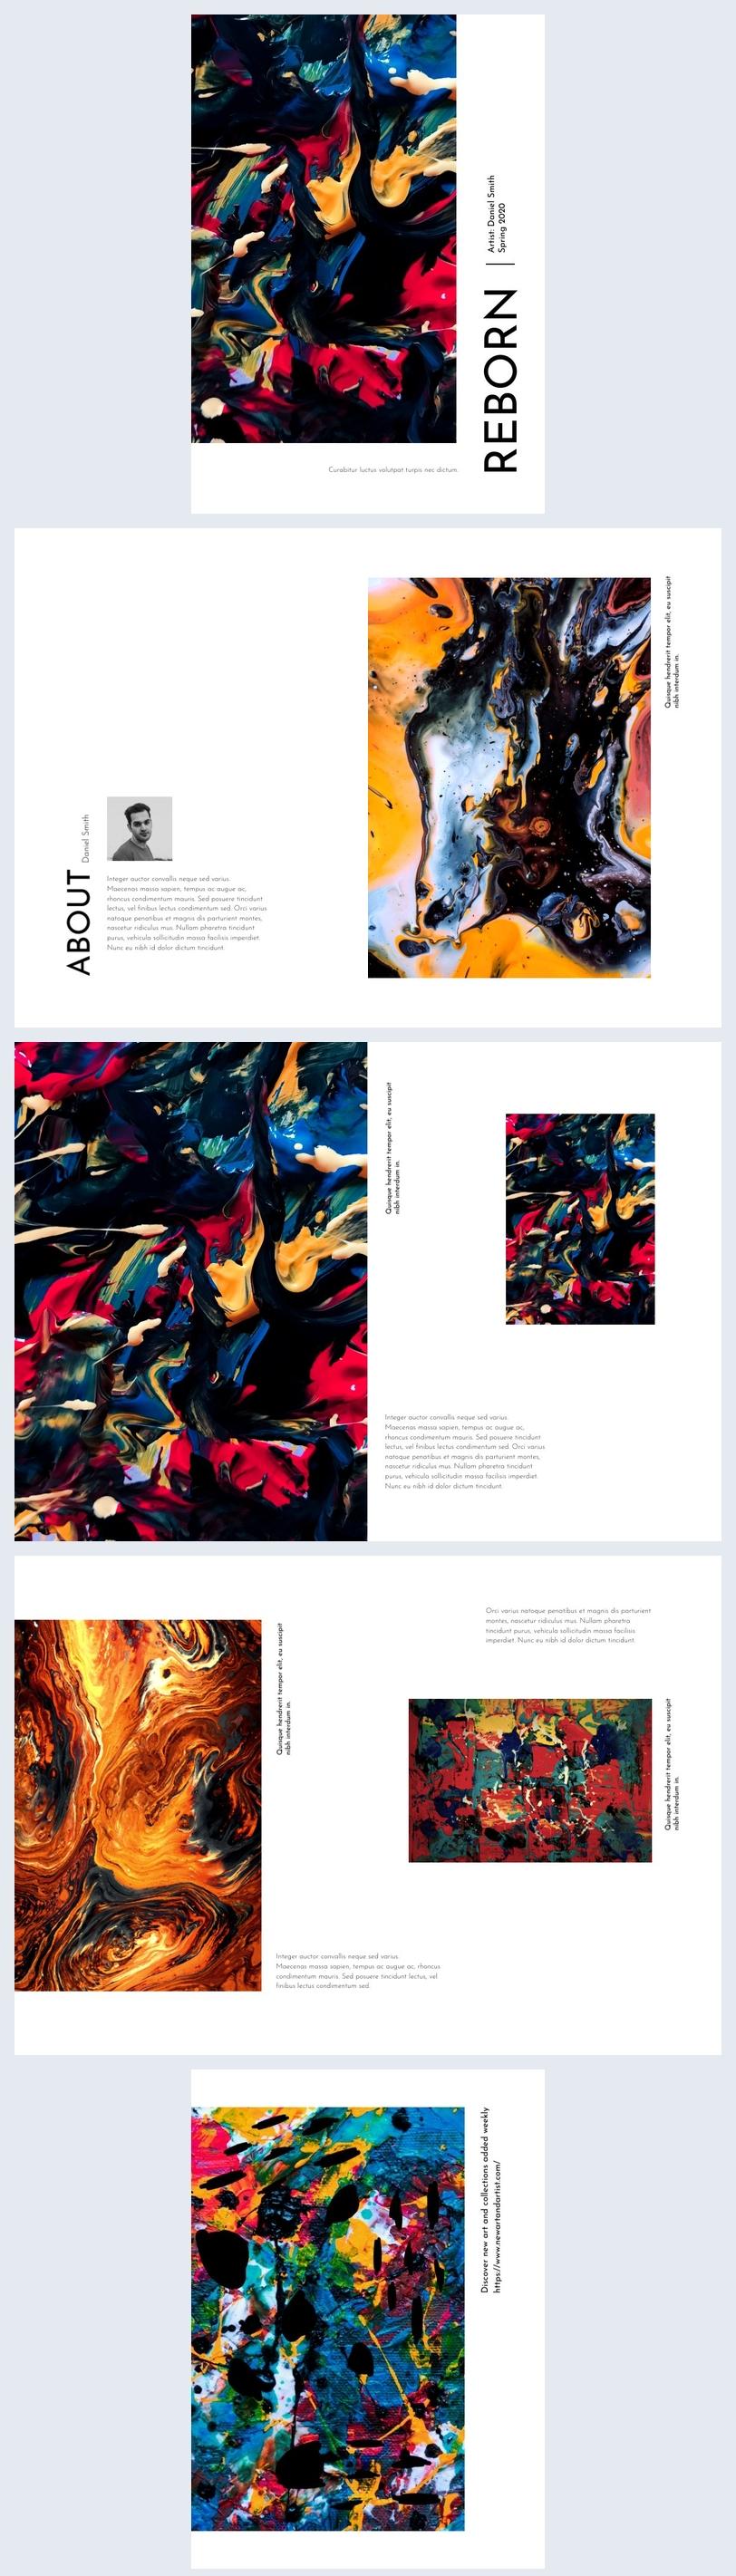 Art Catalog Design Idea